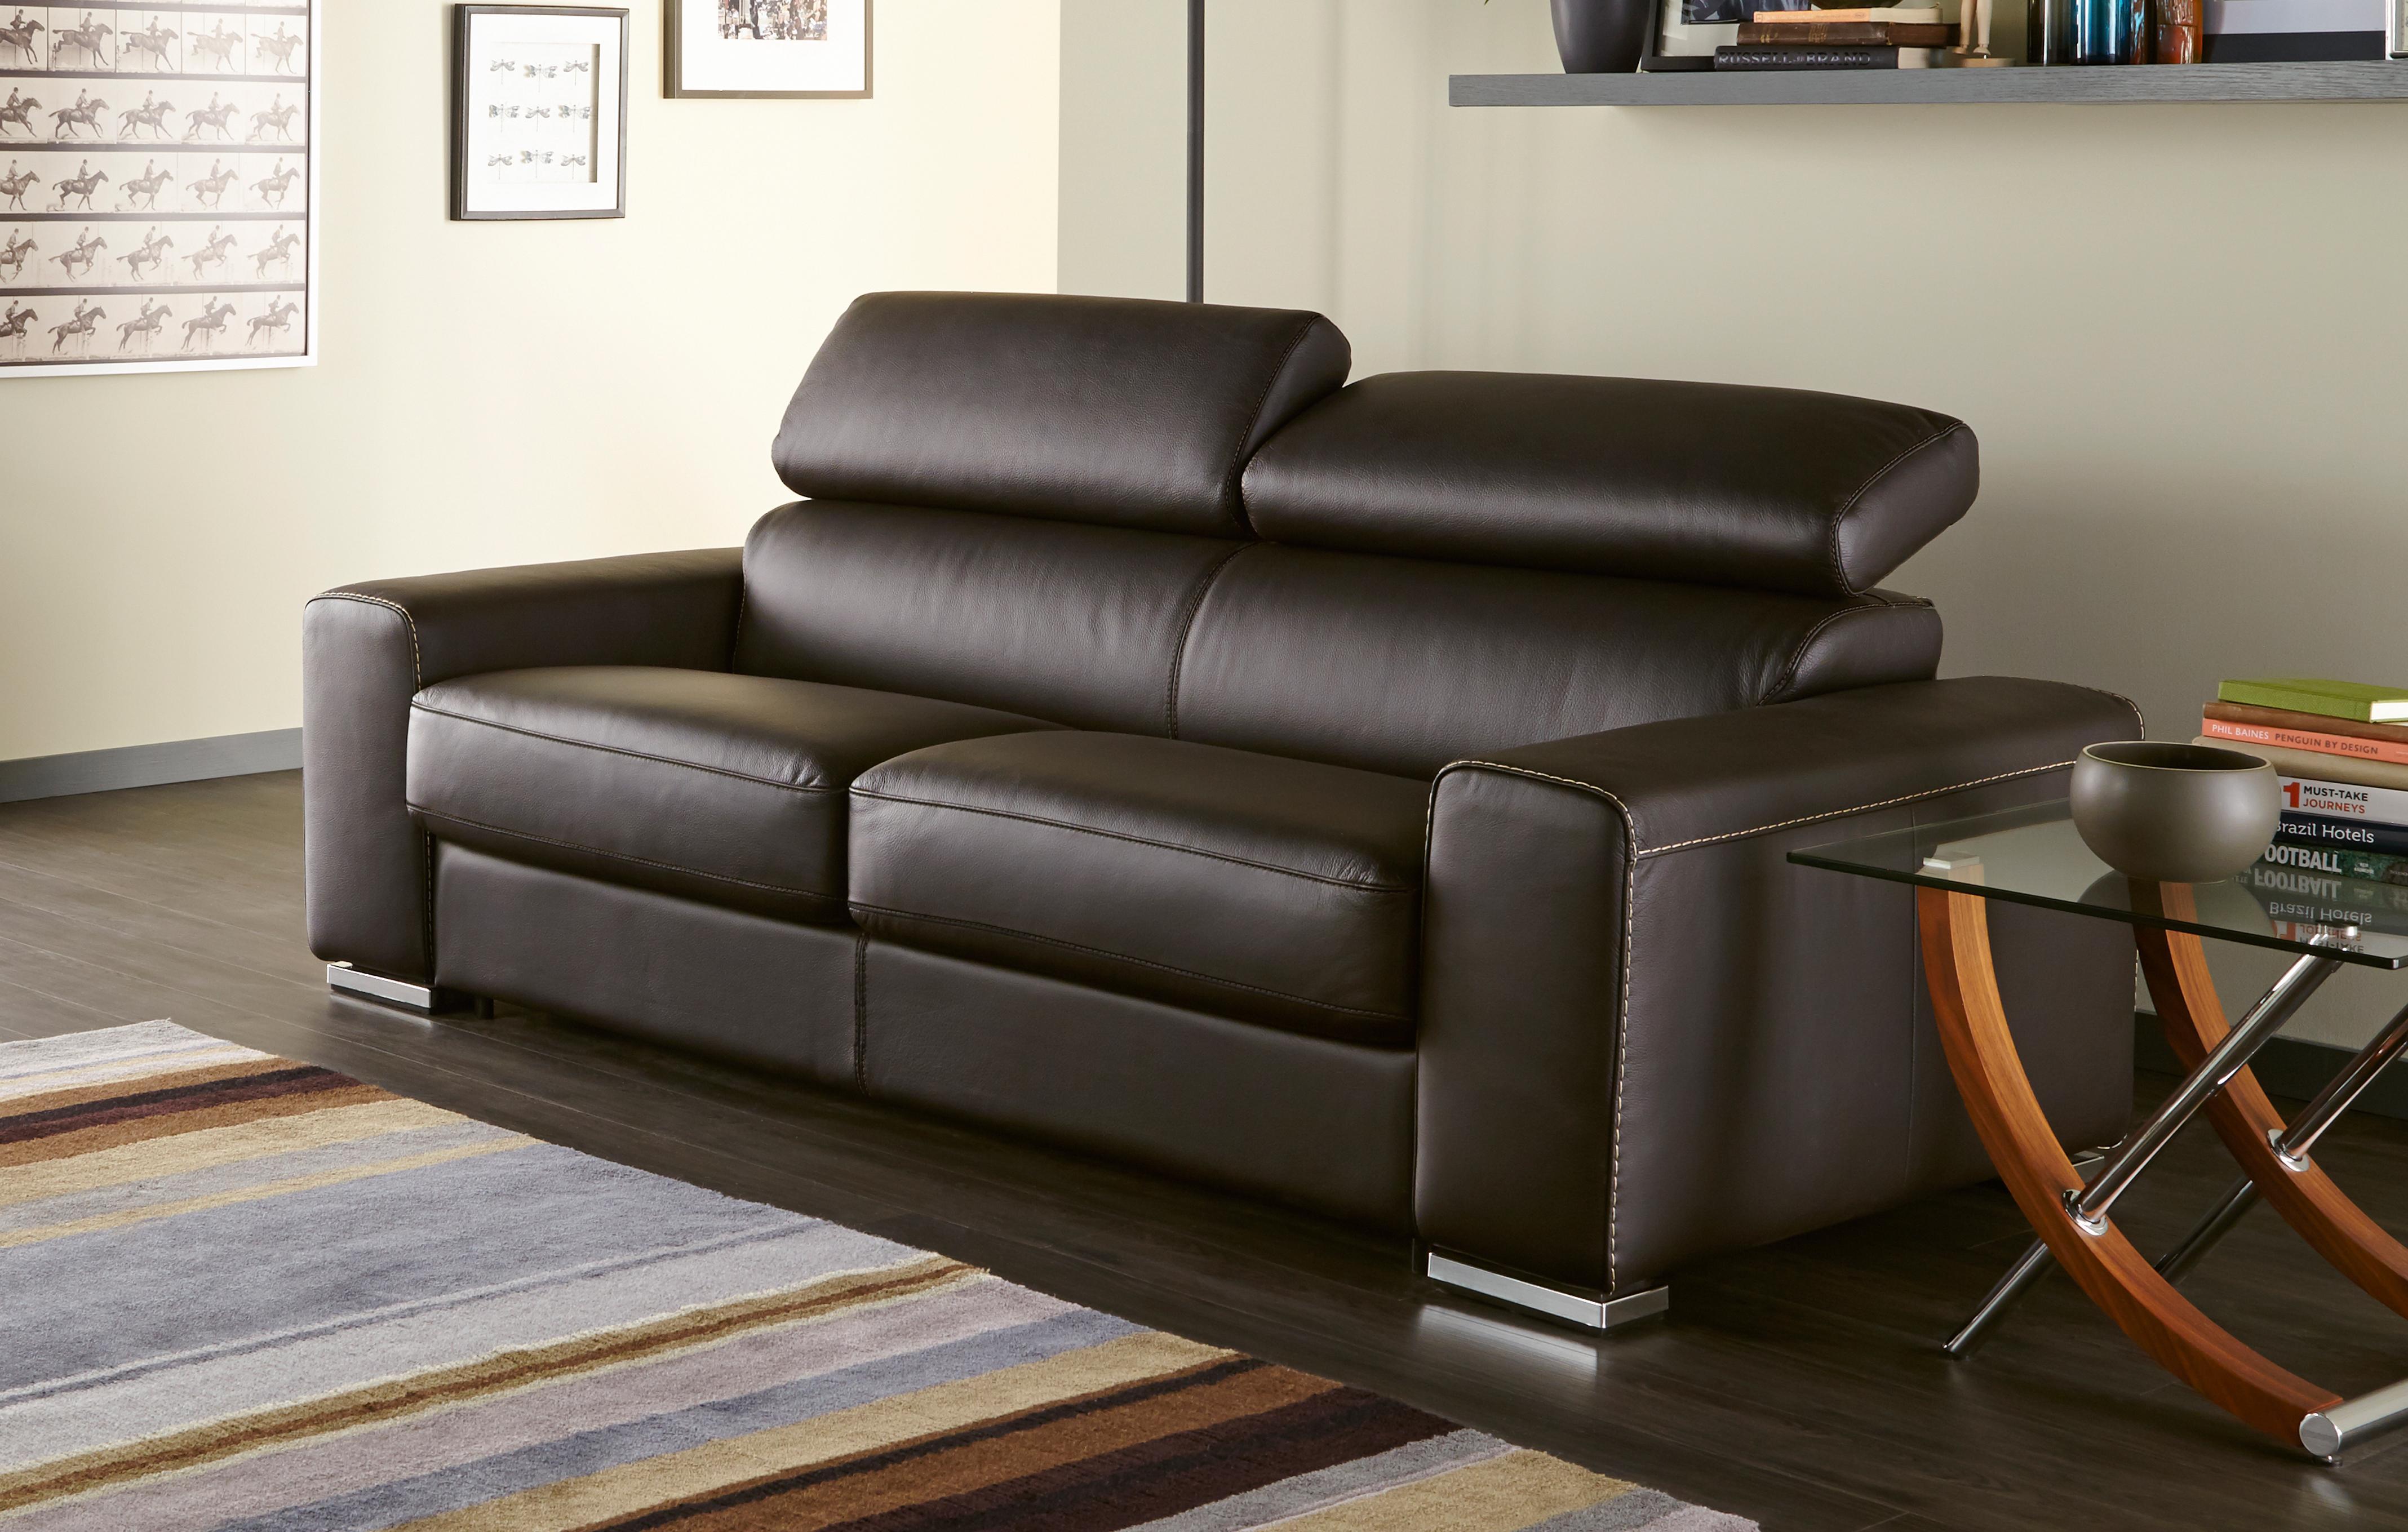 dfs leather 3 seater sofa bed. Black Bedroom Furniture Sets. Home Design Ideas